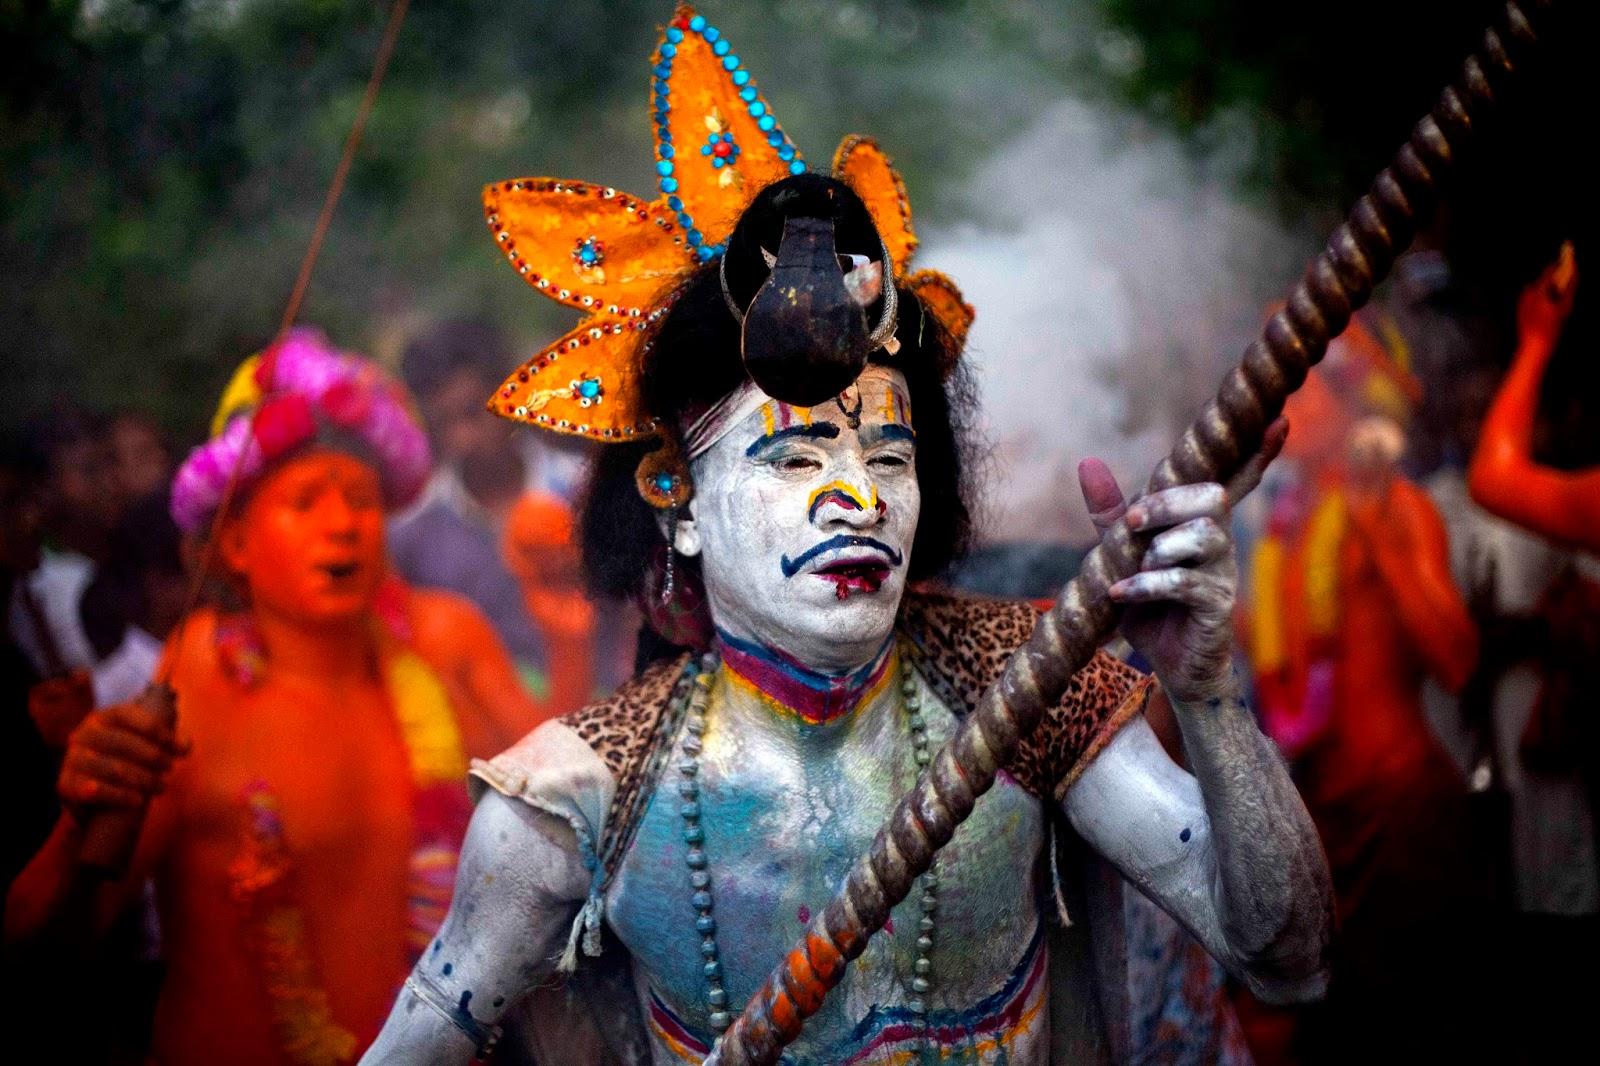 Lal Kach a festival of show power against evil